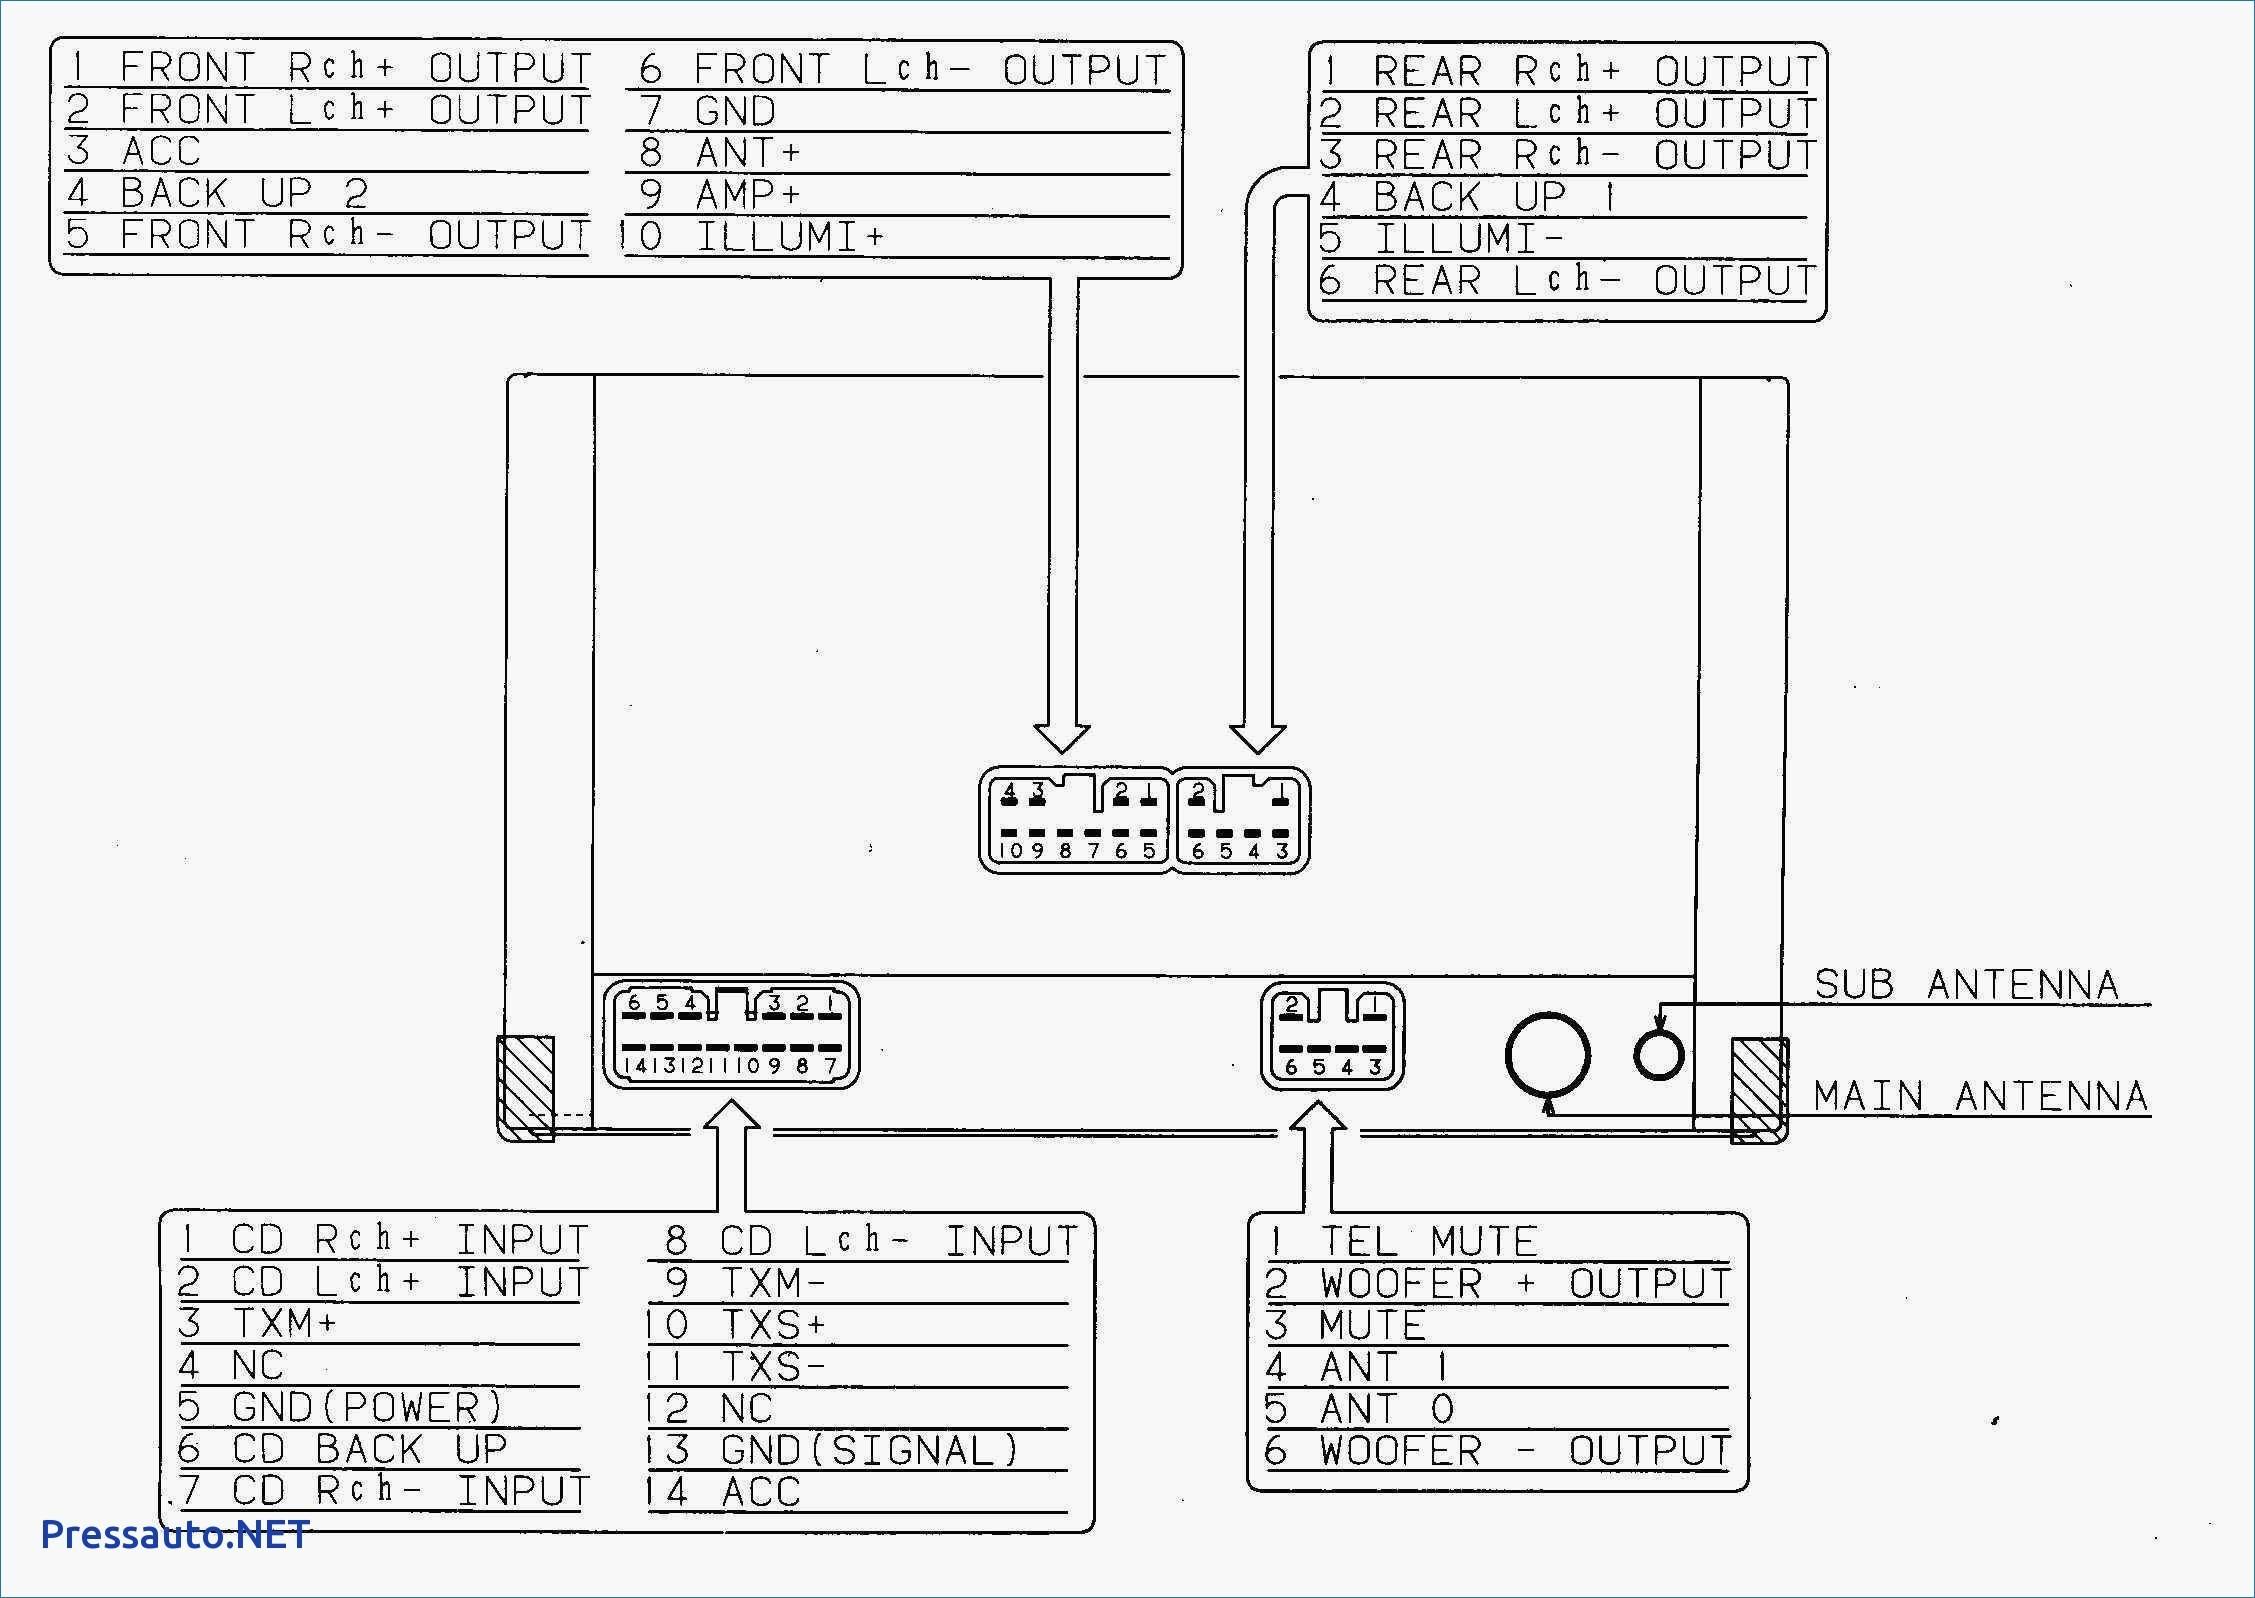 Speaker Wire Diagram for Car Audio Best Speaker Wiring Diagram Diagram